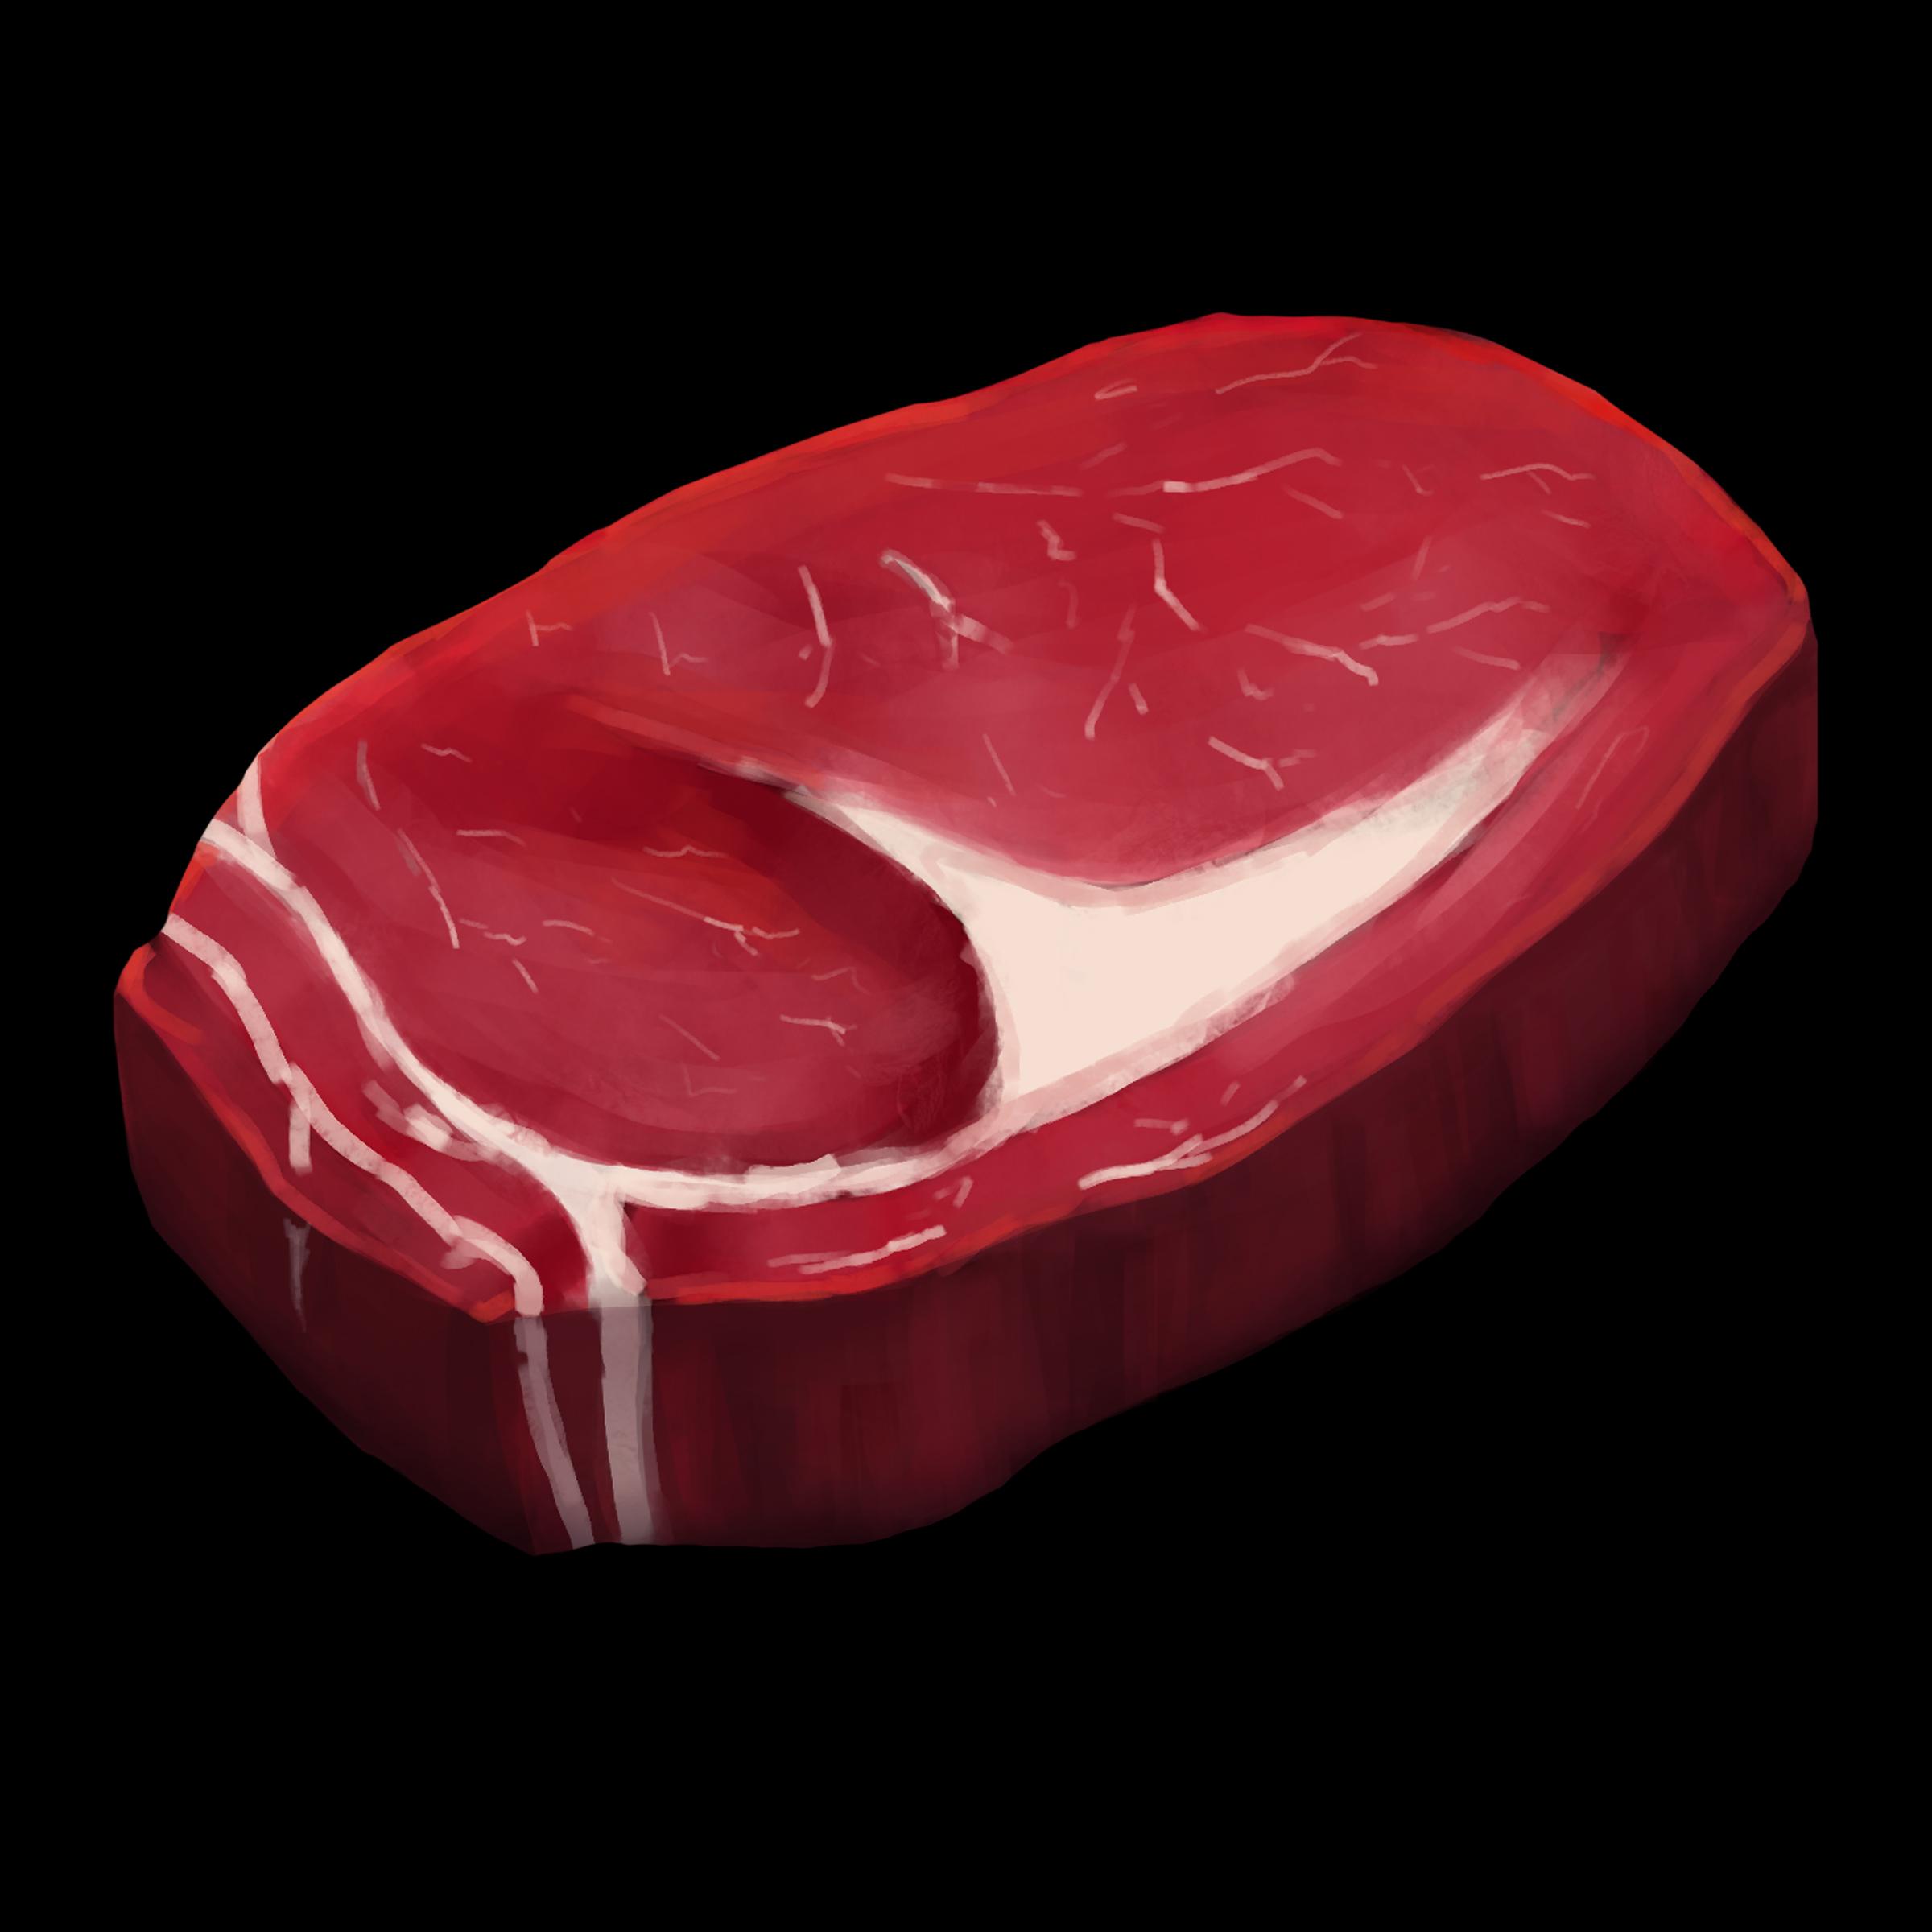 Сырое мясо Говядина | 2D CG, нужна критика и советы.